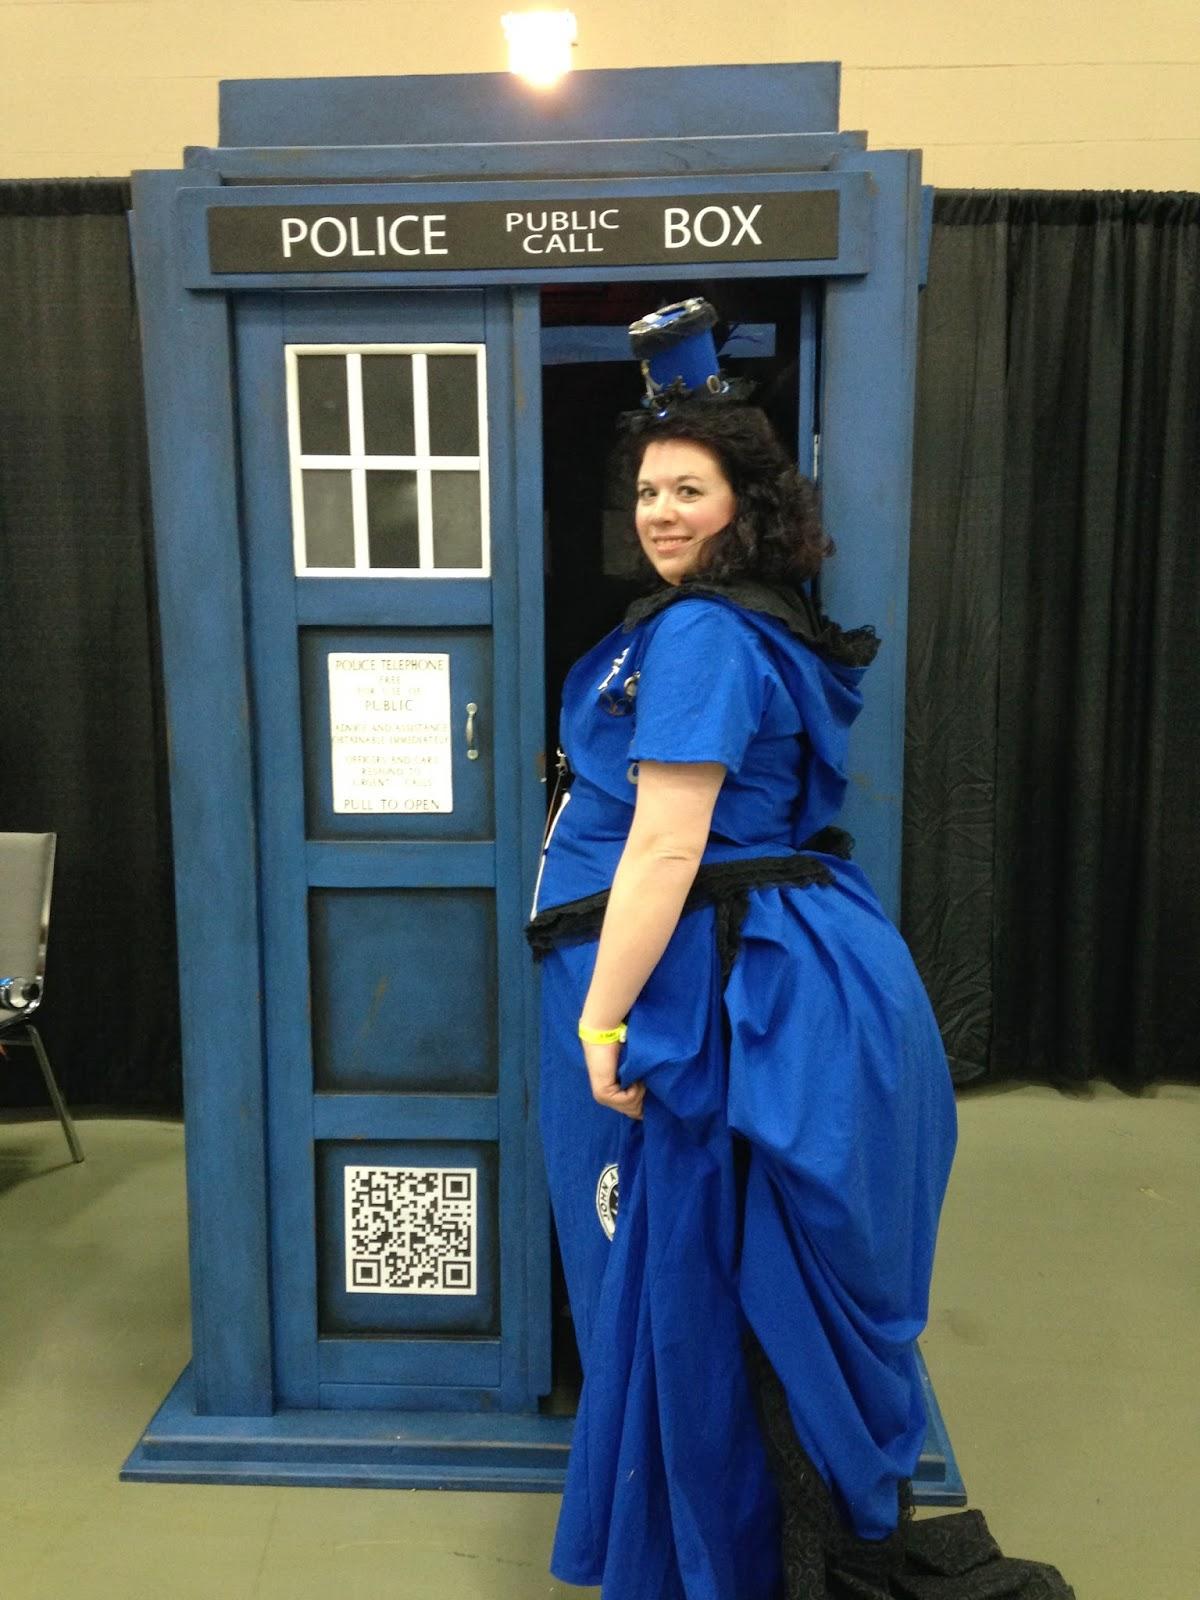 A TARDIS walking into a TARDIS!